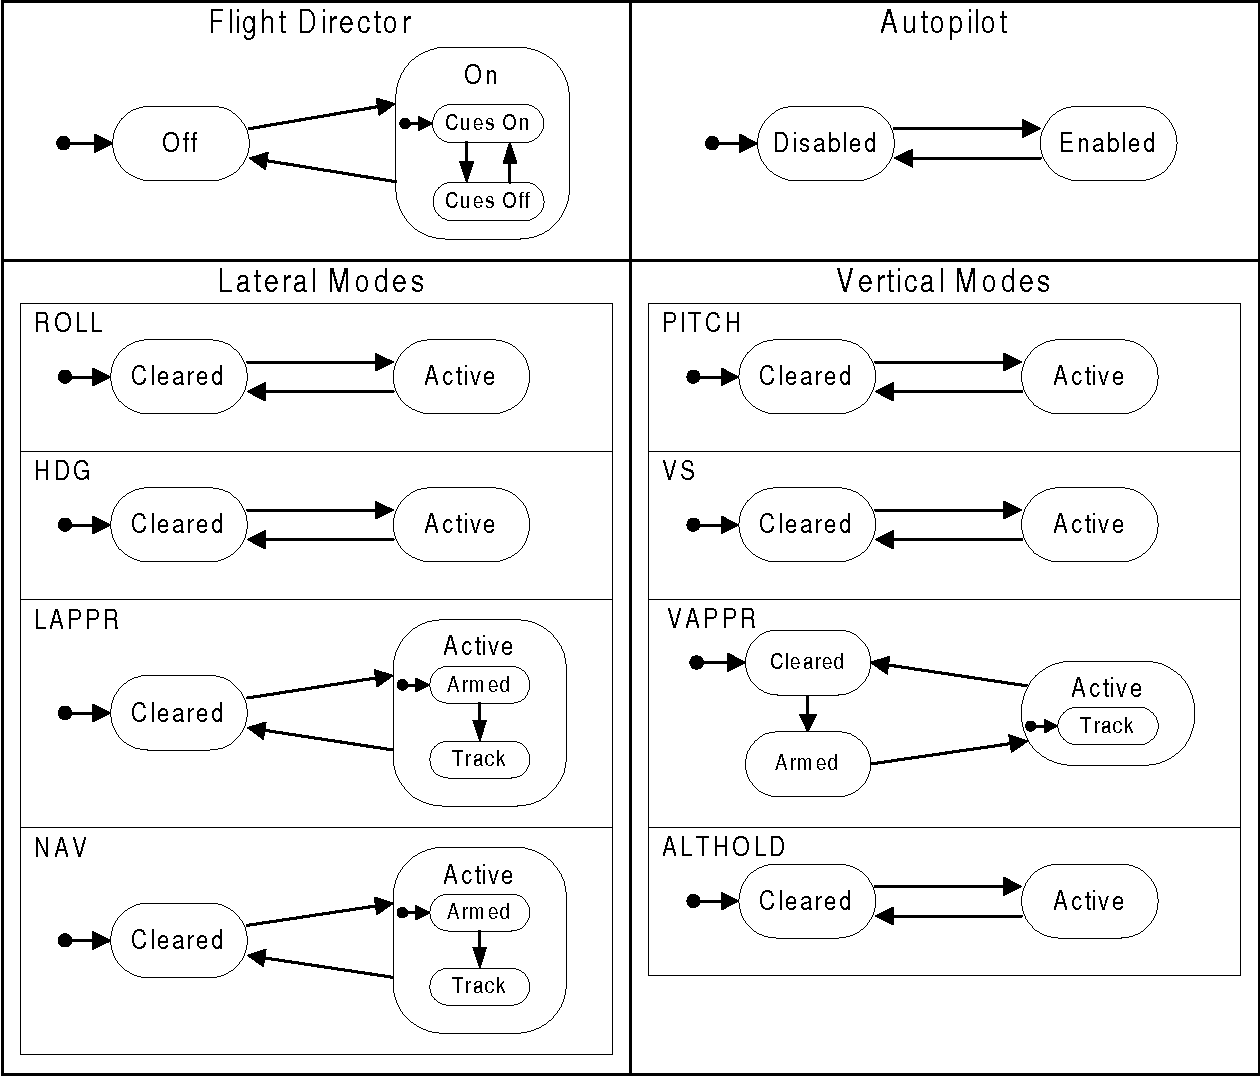 Figure 7 - FGS Mode Structure